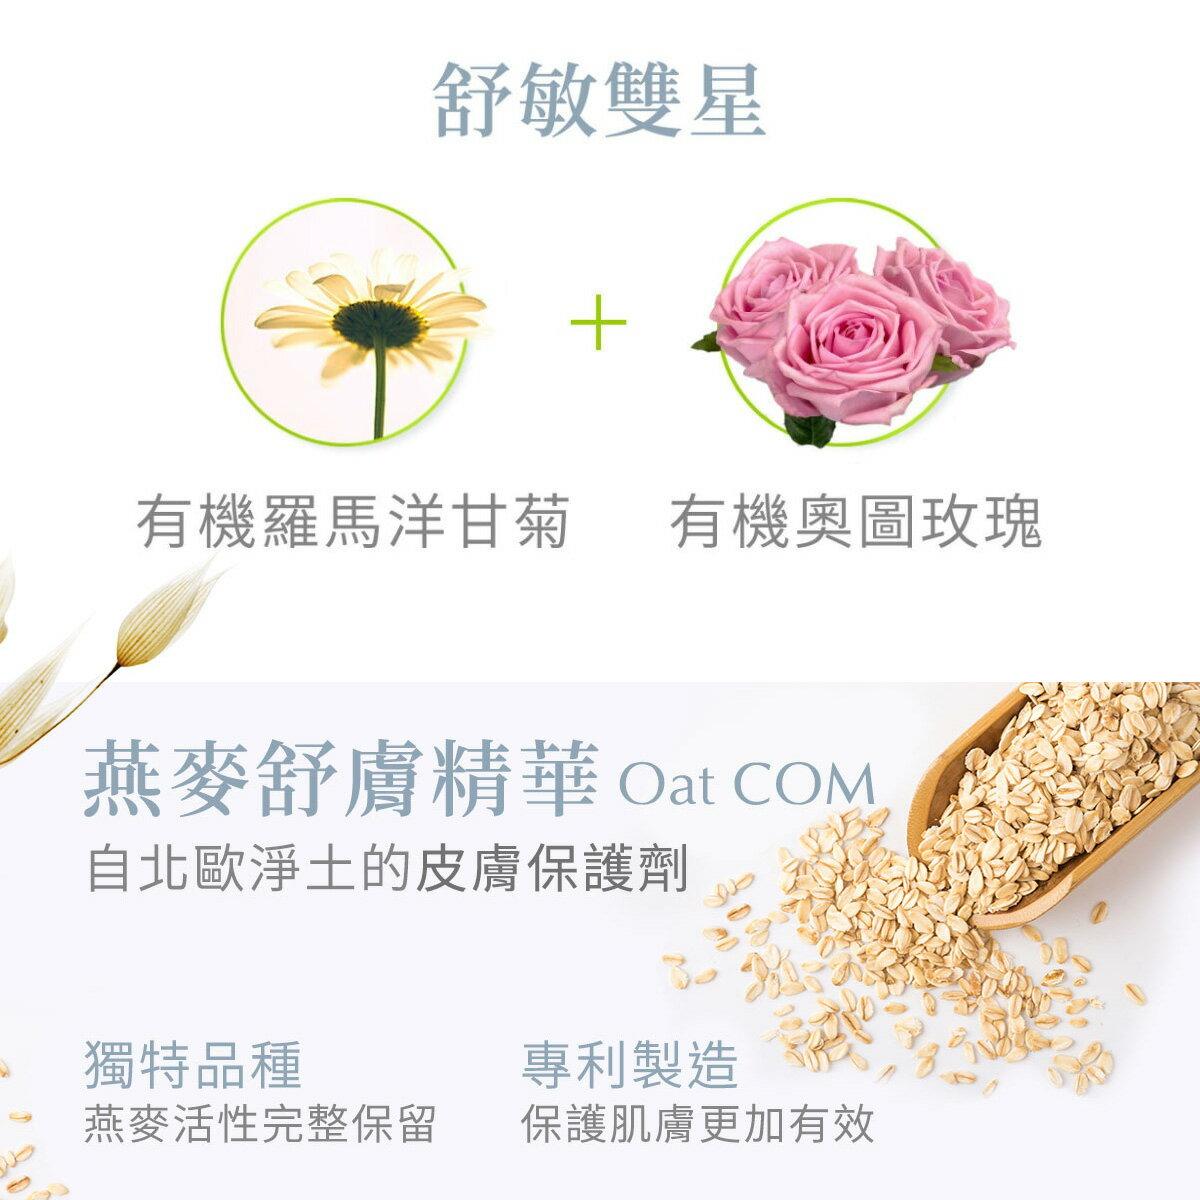 MIT👍滿額贈♥️【Inna Organic 童顏有機】綠茶玫瑰舒膚純露面膜 (1片) 4